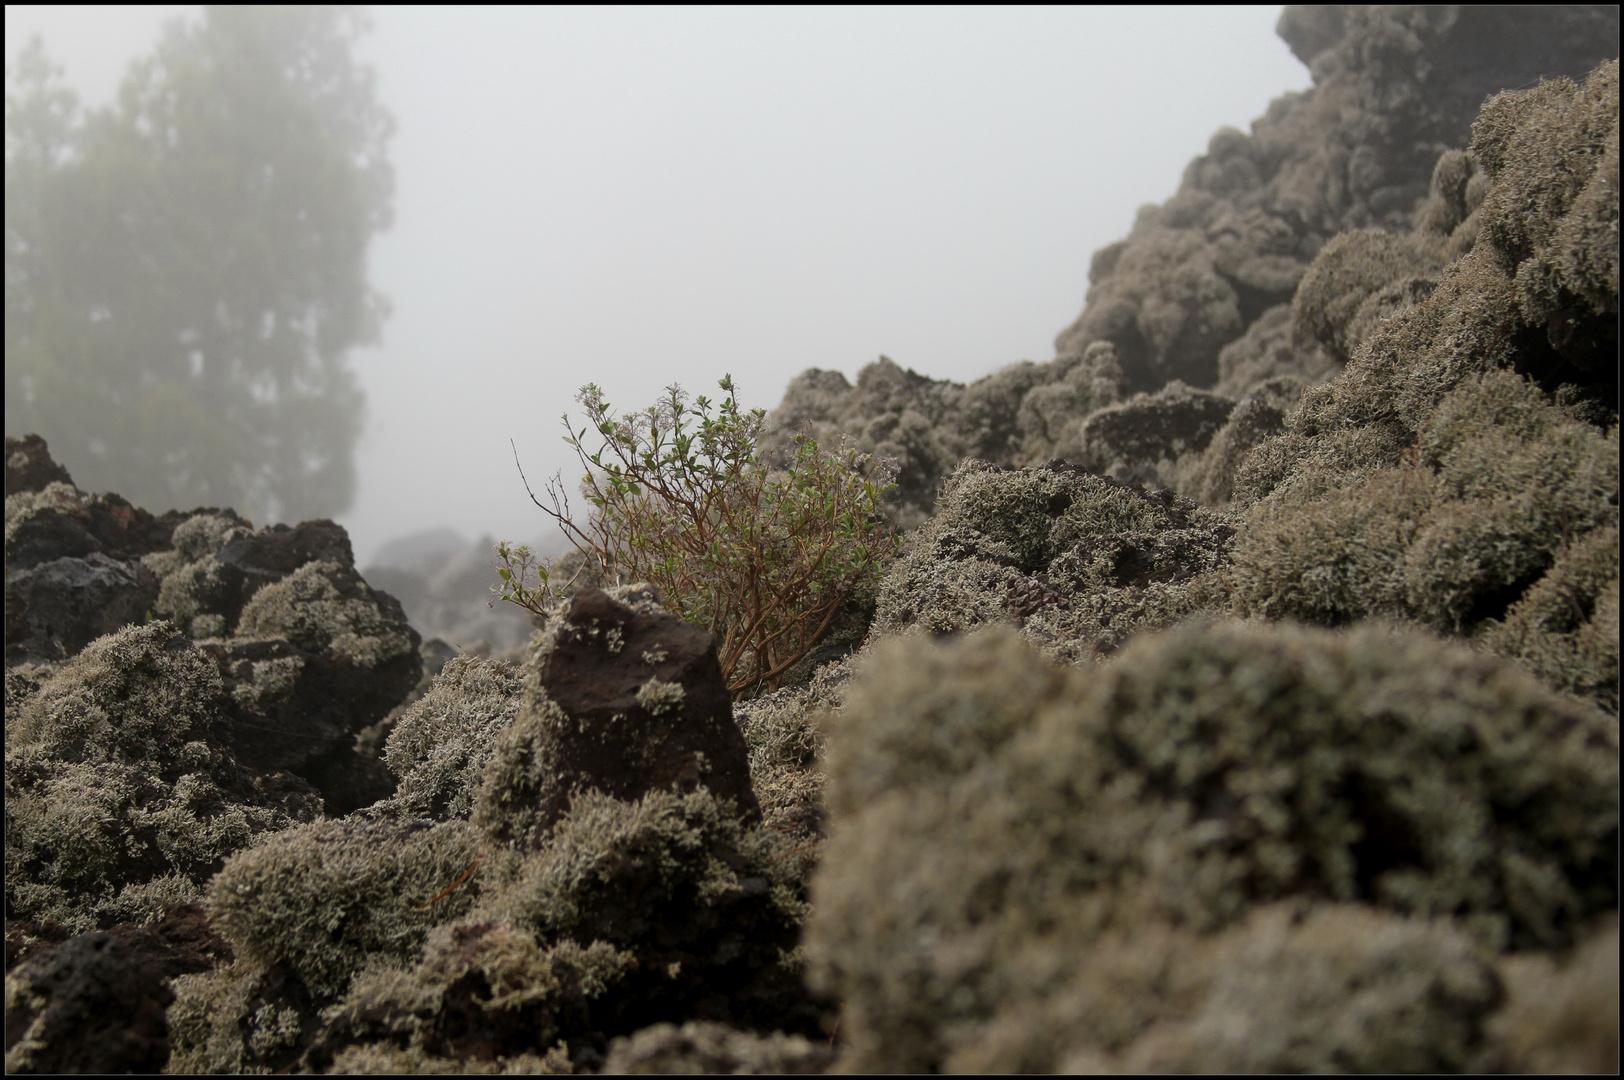 Foggy Lava Landscape